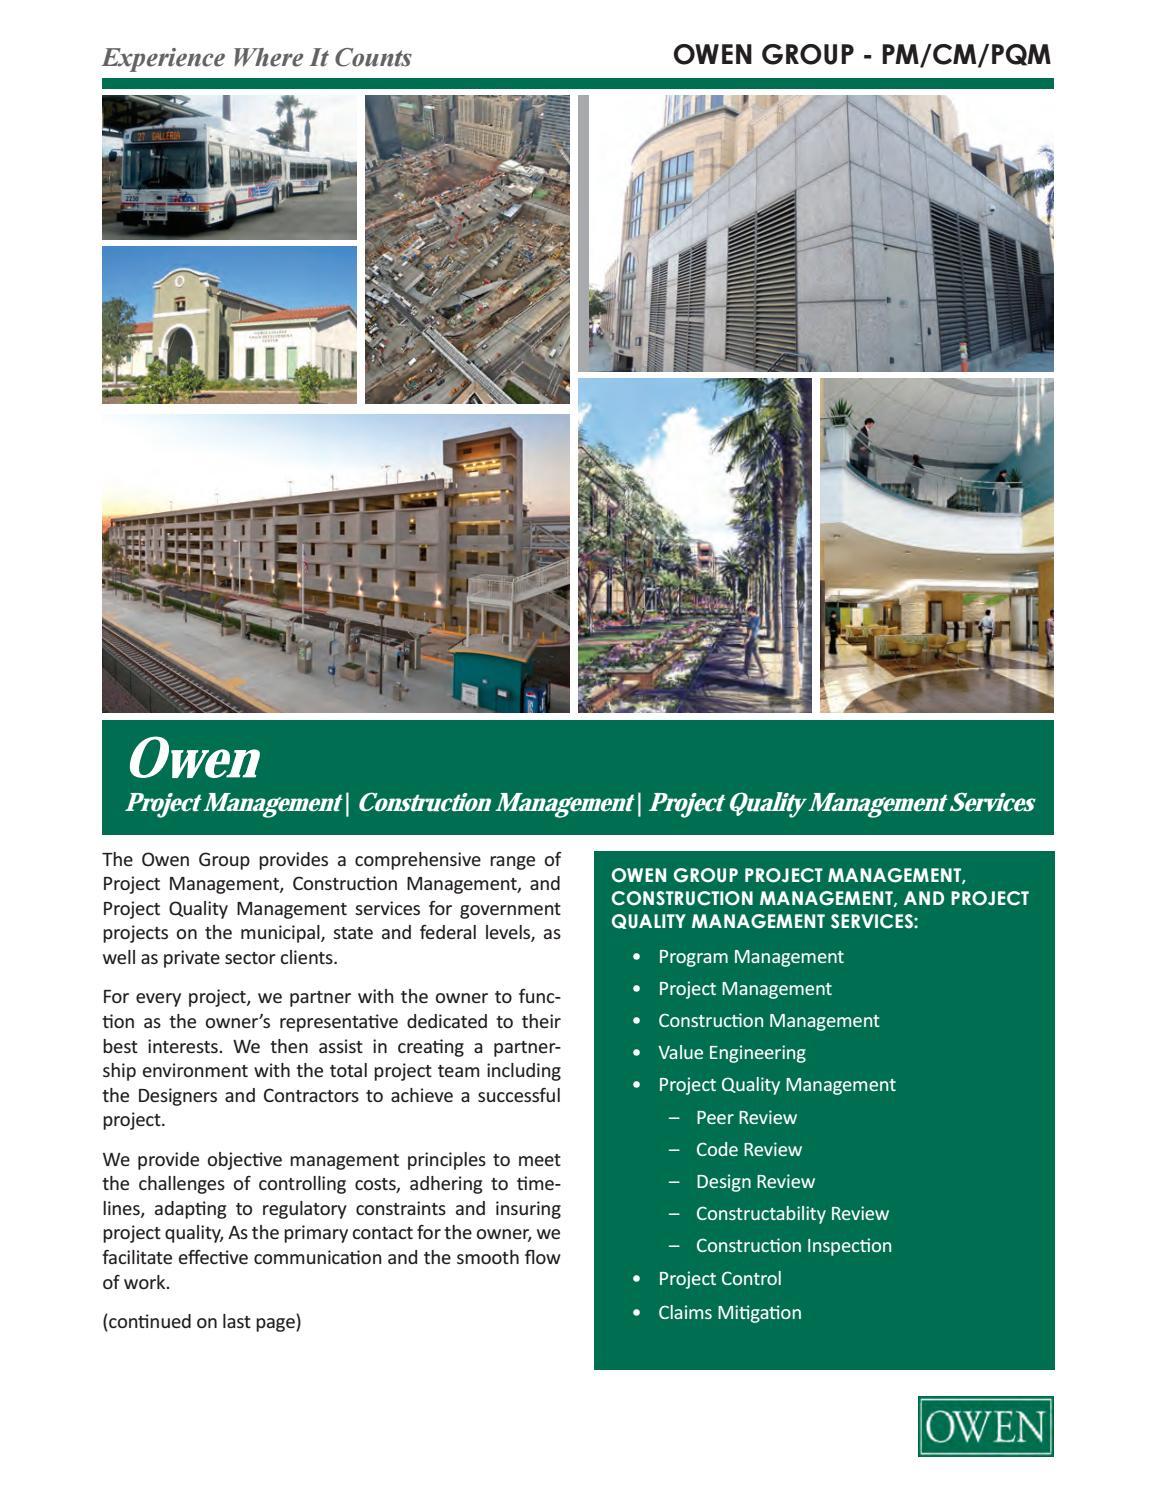 Construction Management - General by Owen Admin - issuu